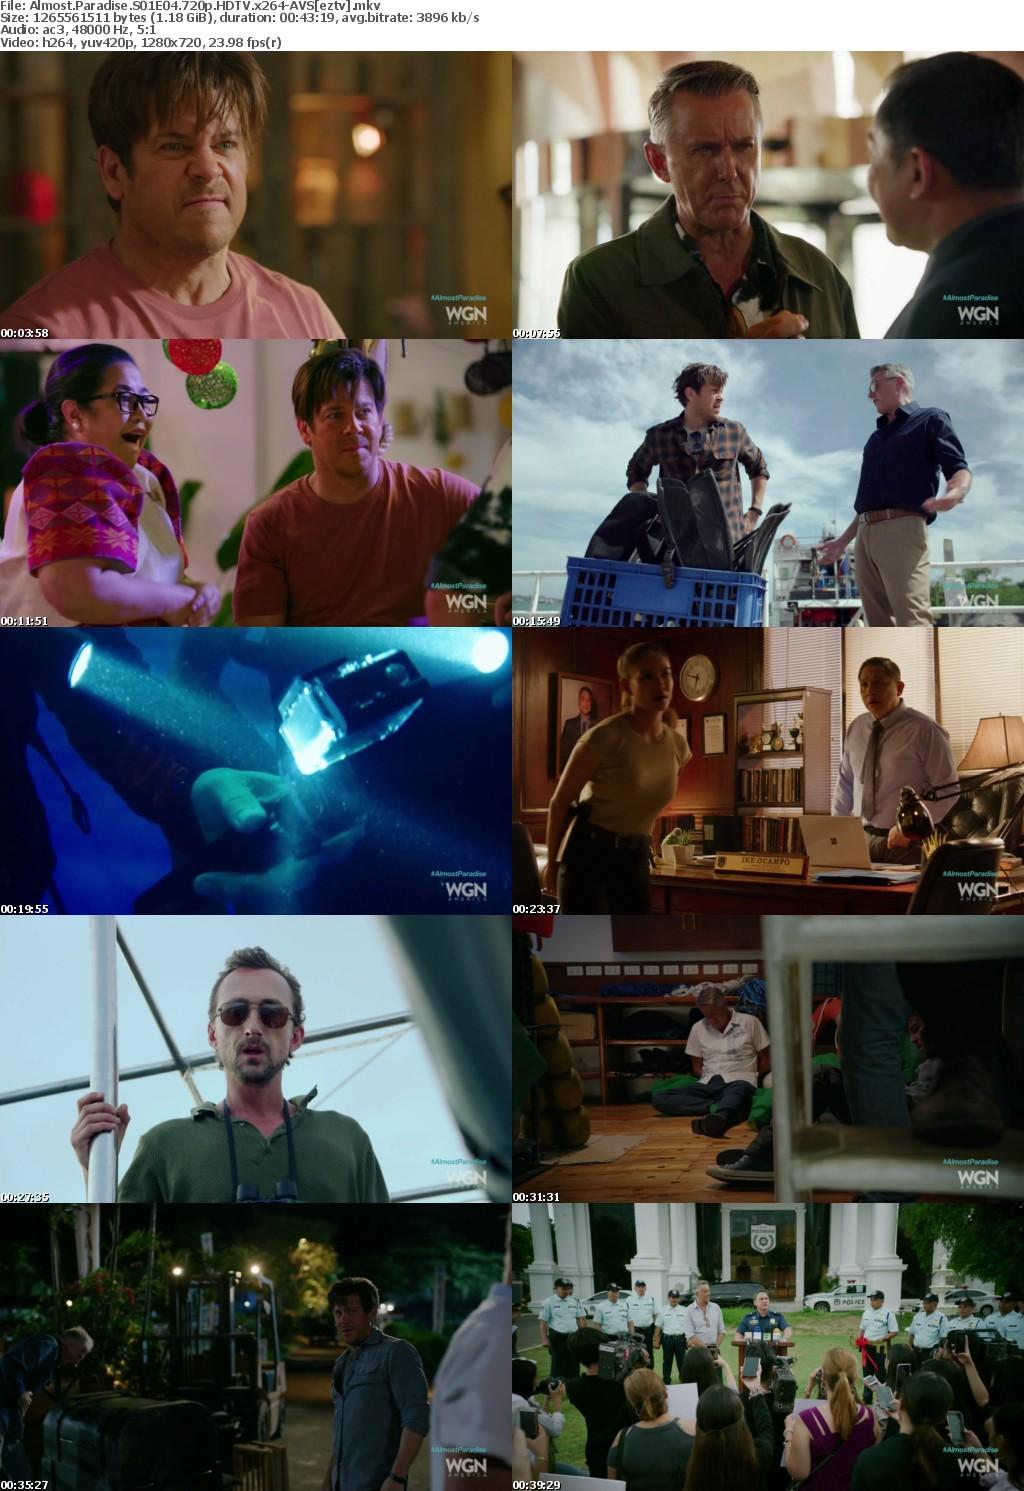 Almost Paradise S01E04 720p HDTV x264-AVS